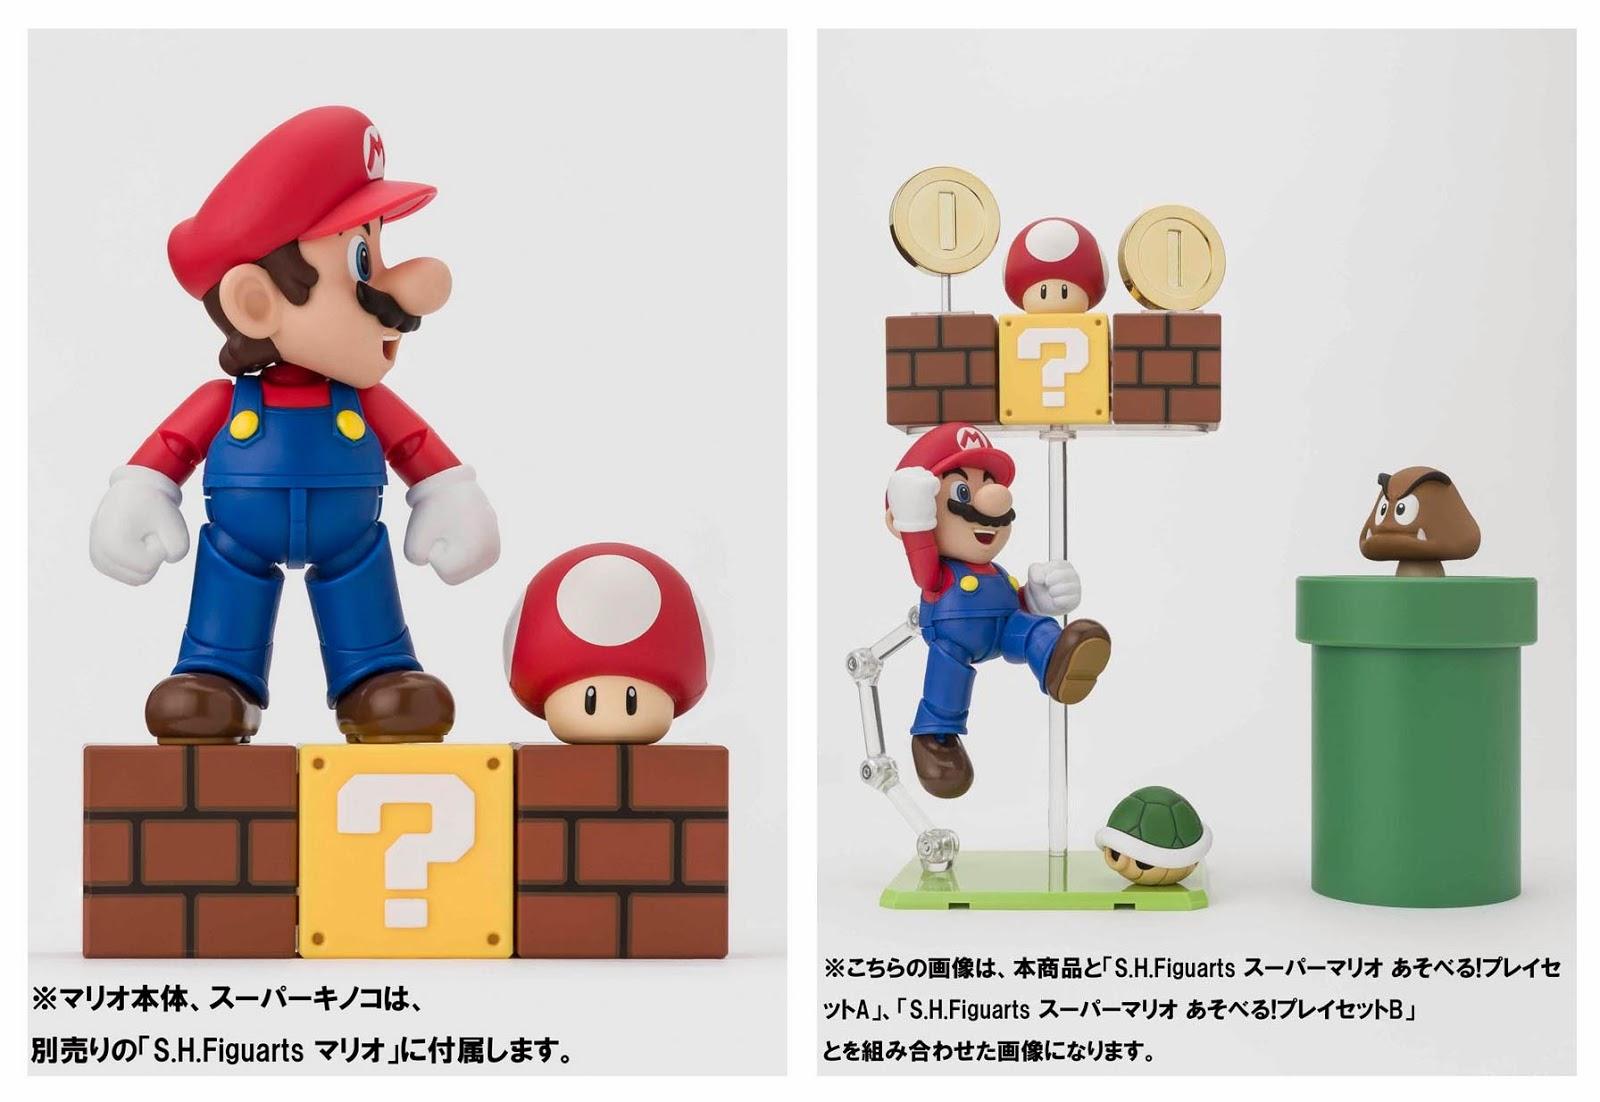 Official Release Photos SHFigurearts Super Mario Playset